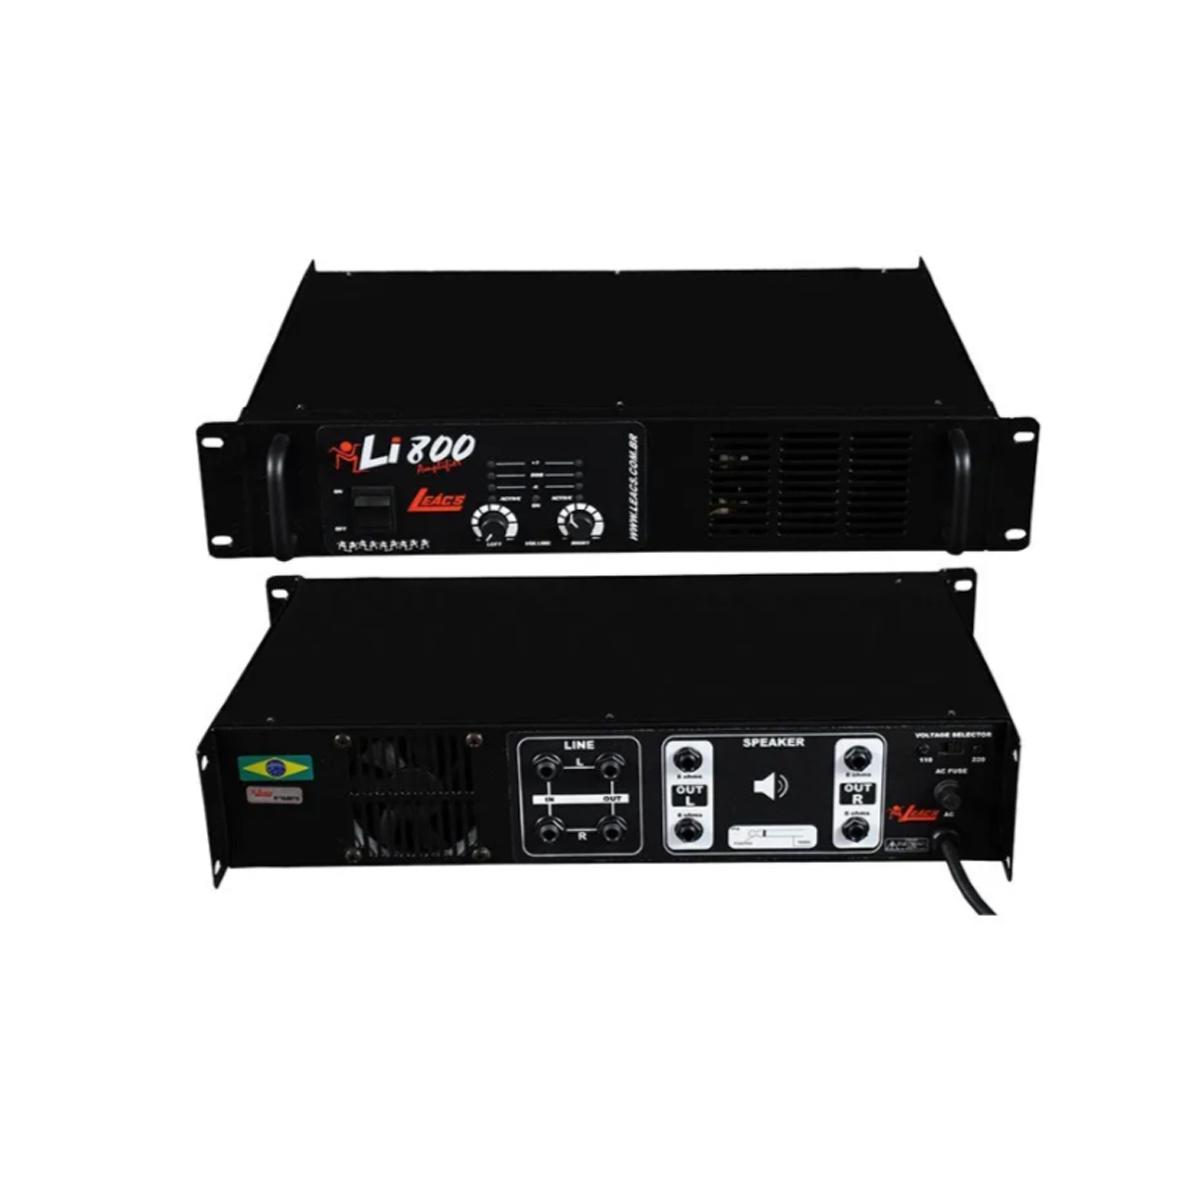 Amplificador De Potência Li800 200w